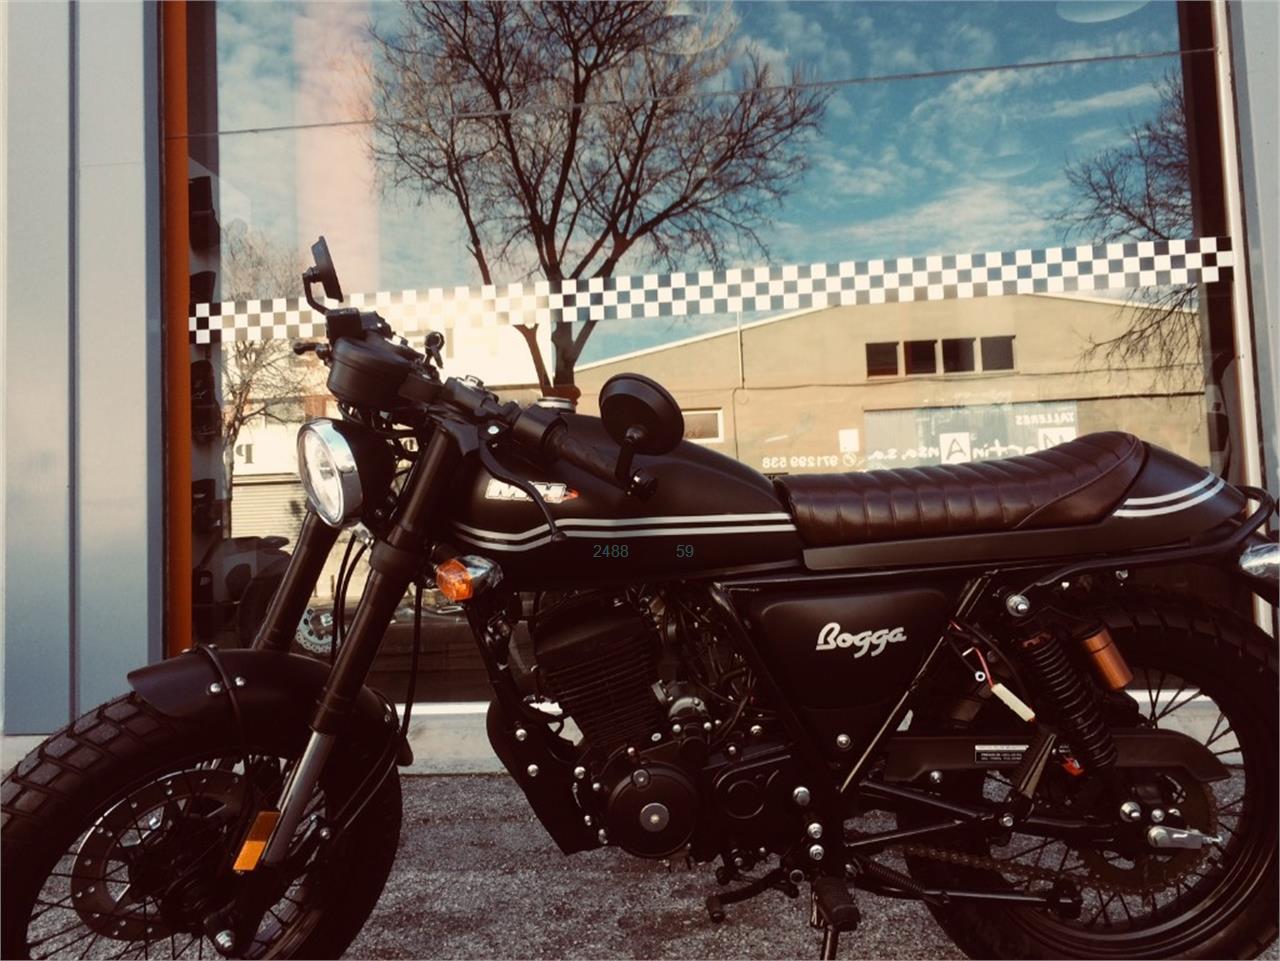 MOTOR HISPANIA STREET 125 AC